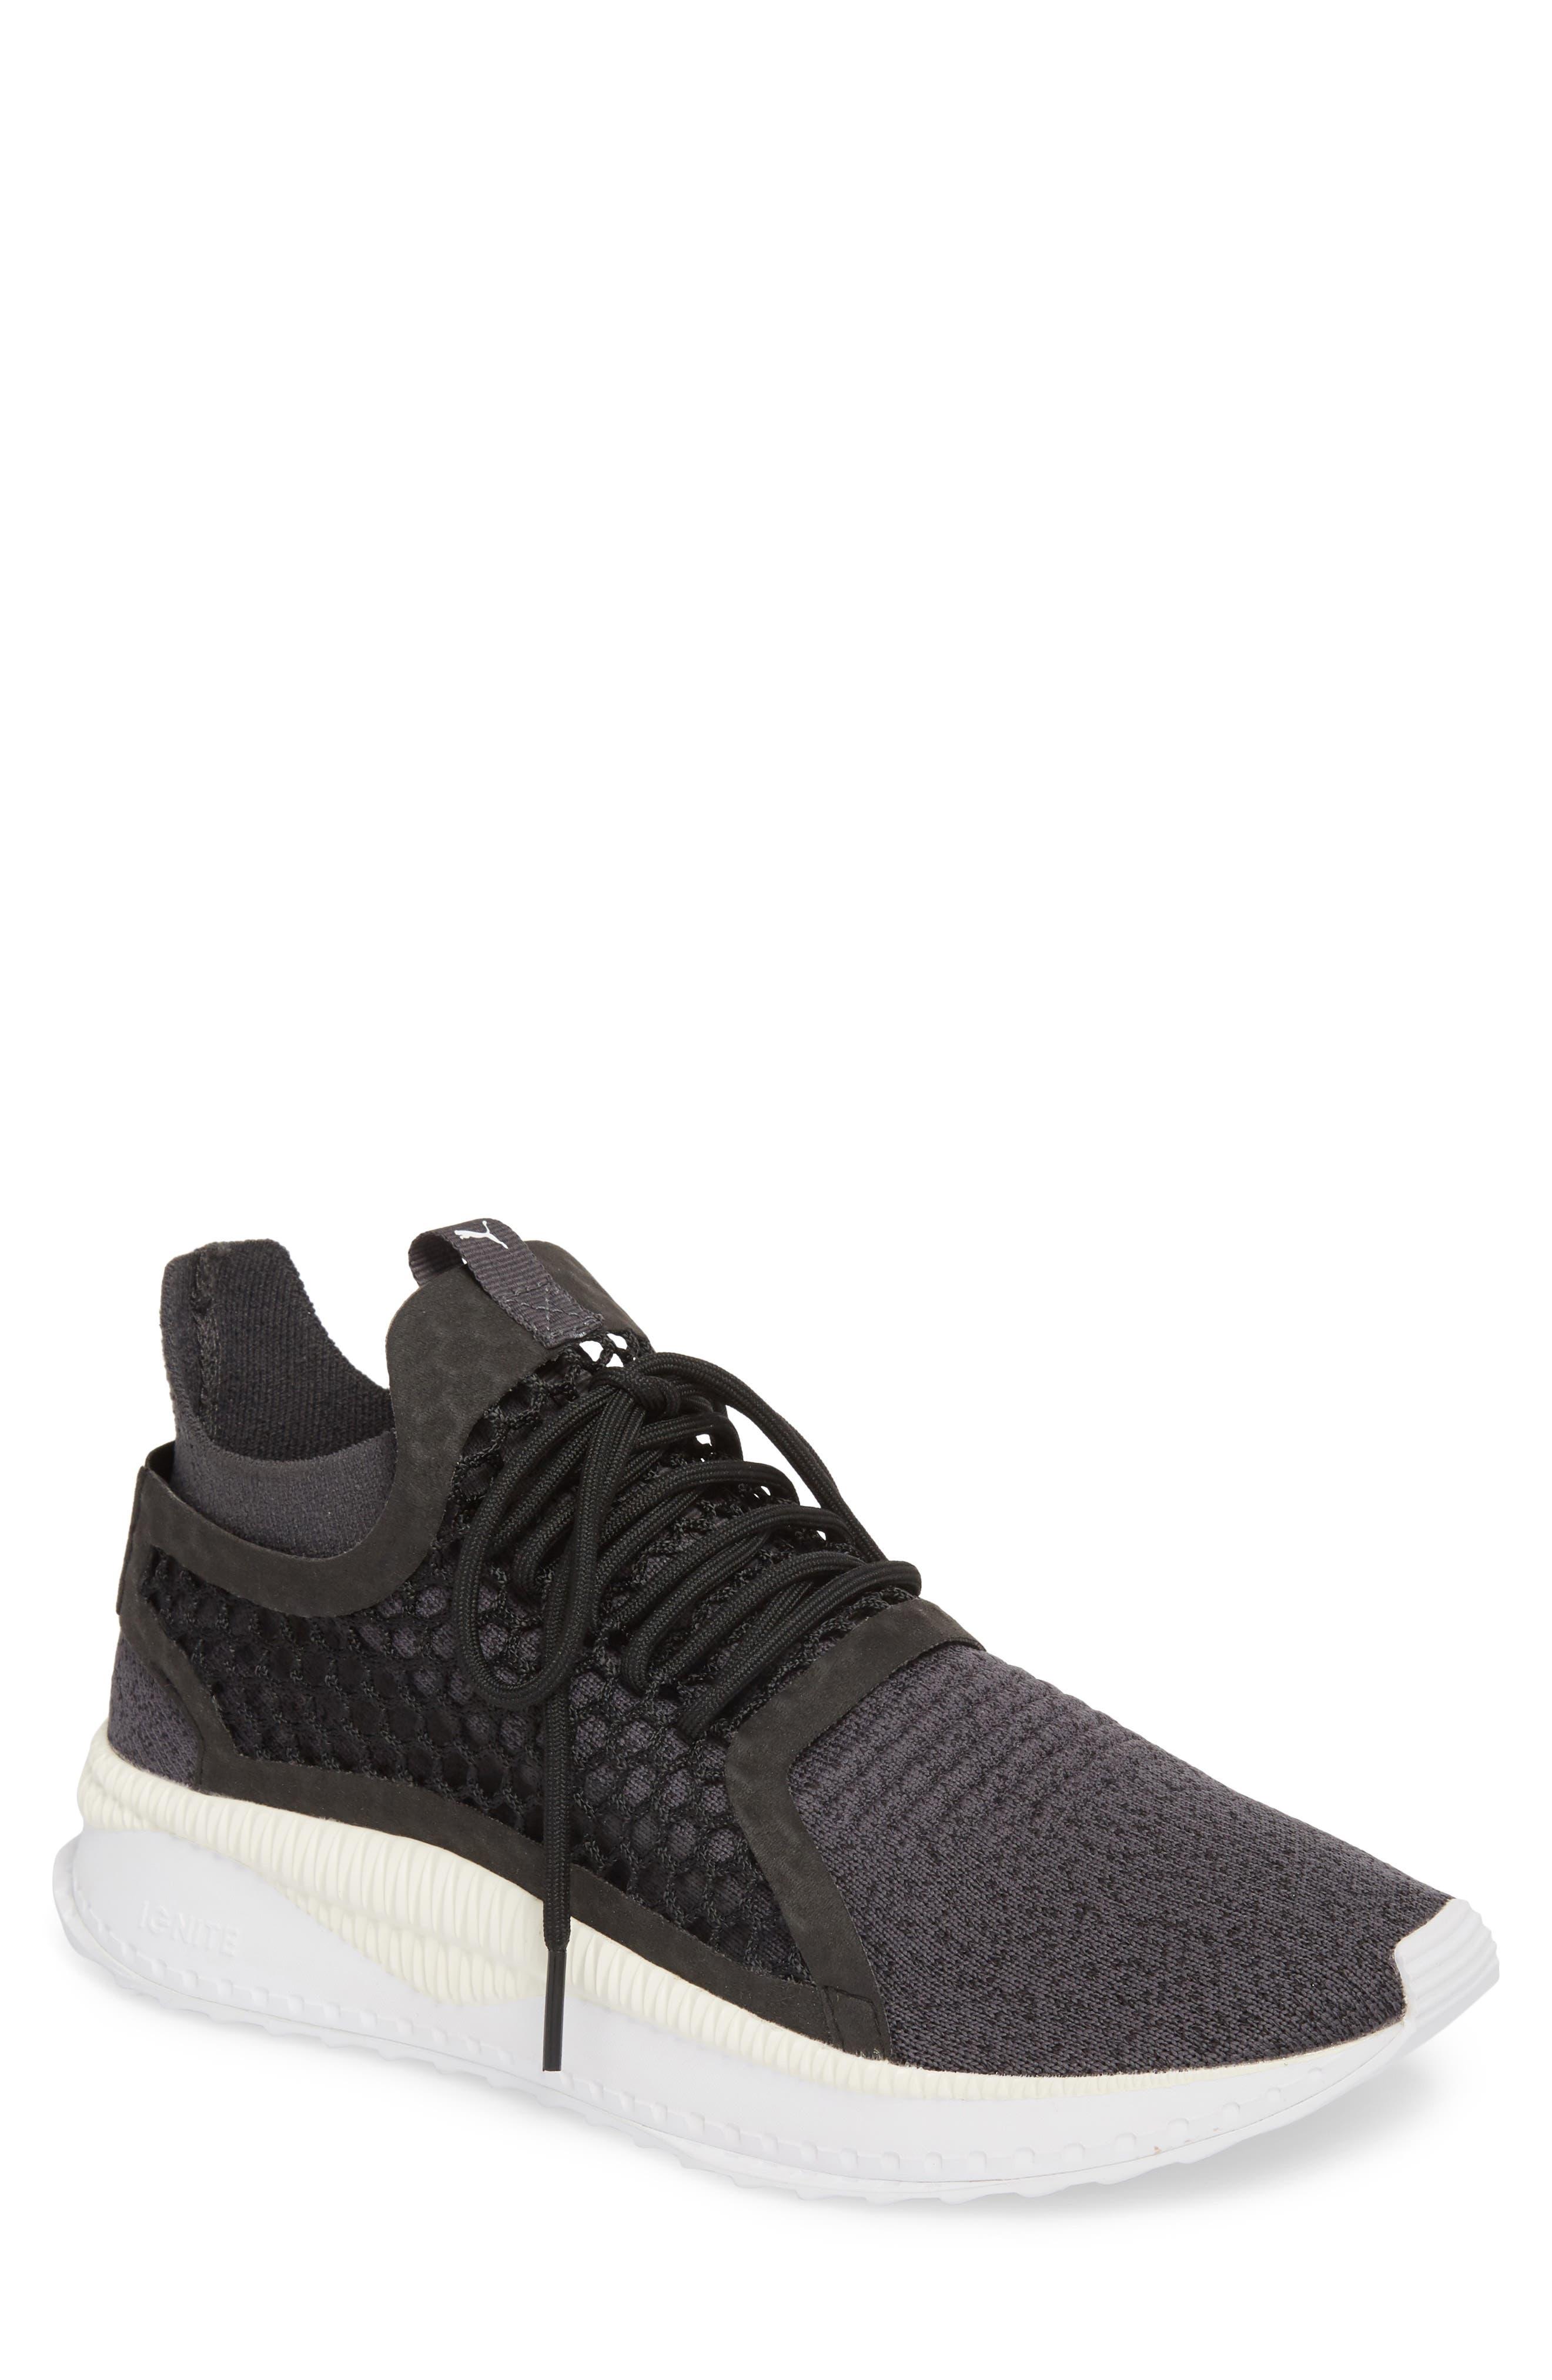 Tsugi Netfit V2 EvoKNIT Sneaker,                             Main thumbnail 1, color,                             Black/ Asphalt/ White